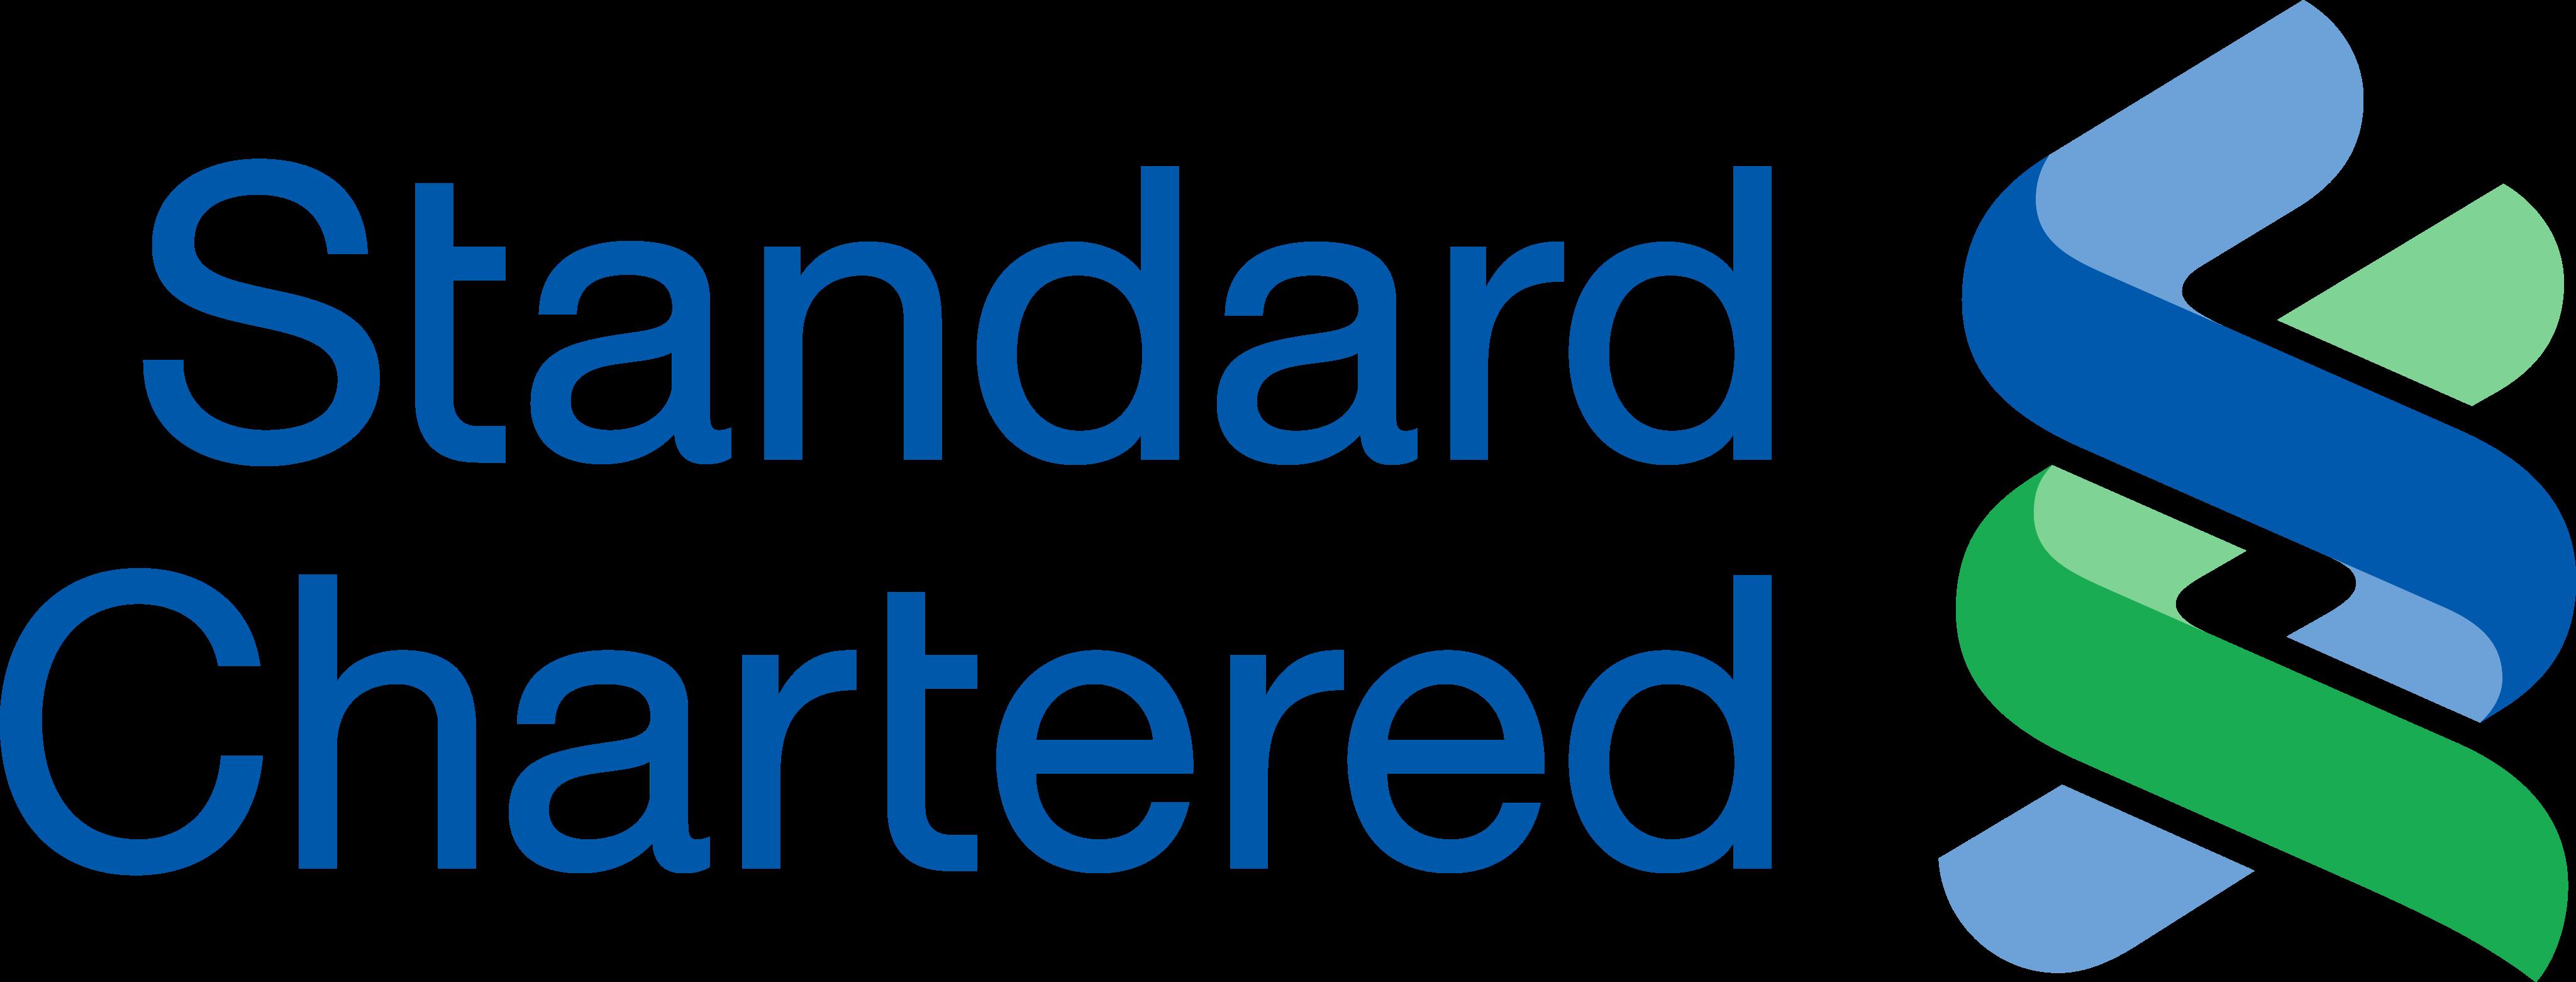 standard chartered logo - Standard Chartered Logo